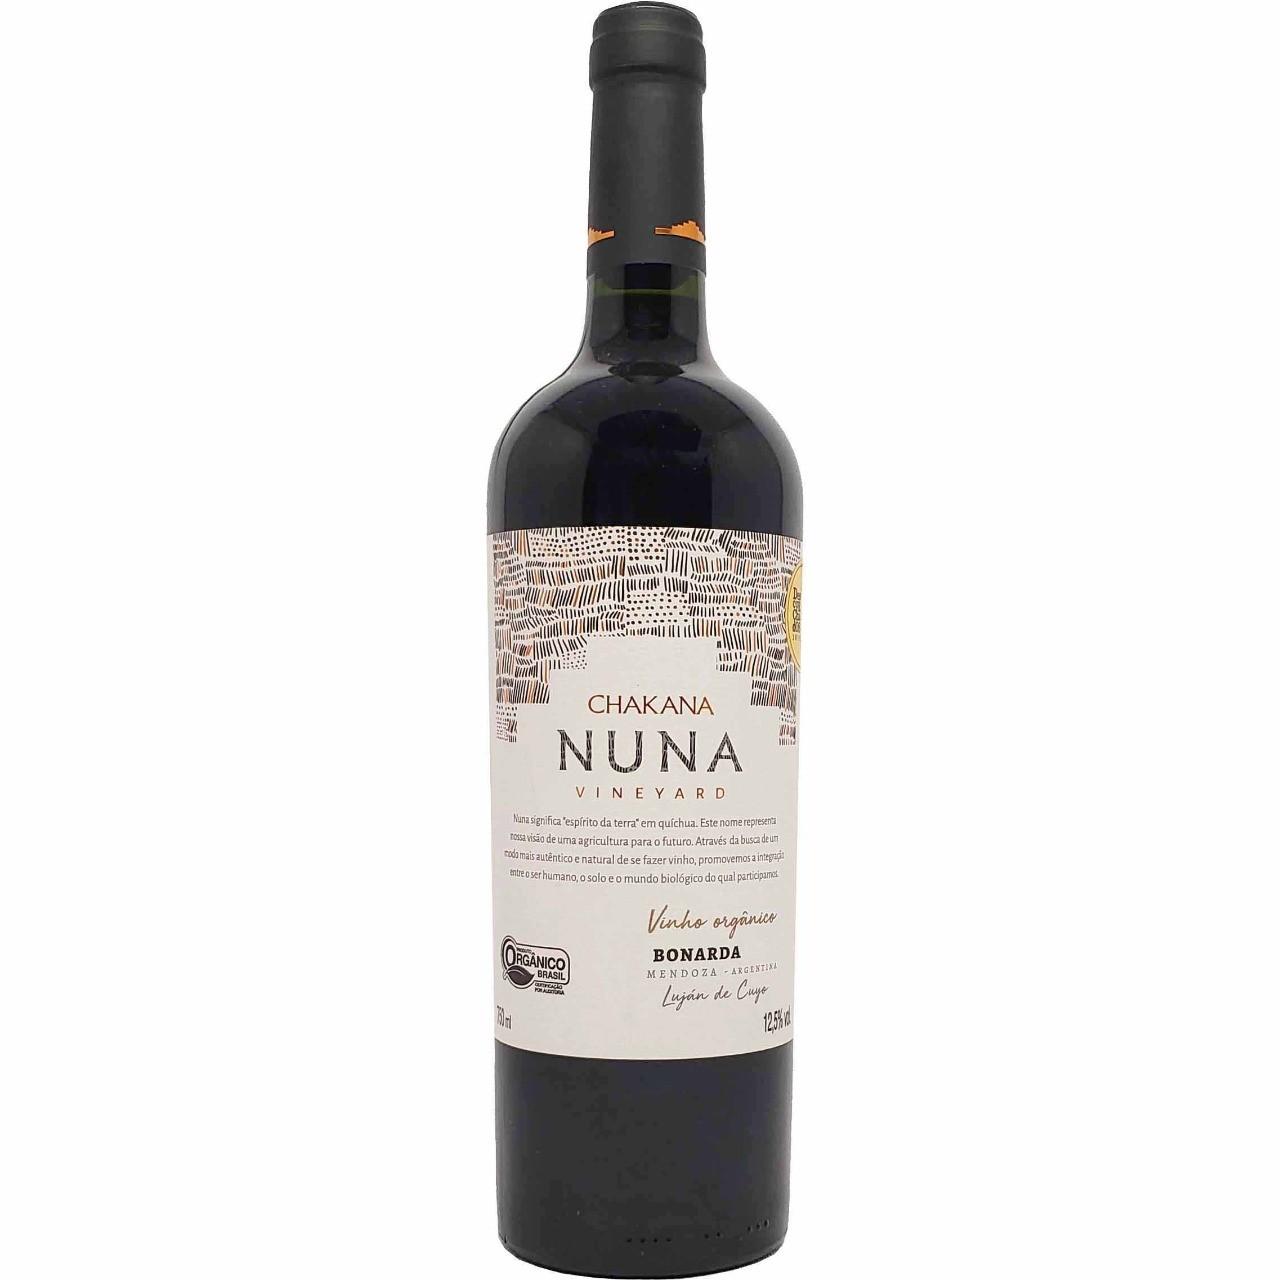 Vinho Tinto Orgânico Chakana Nuna Vineyard Bonarda - 750ml -